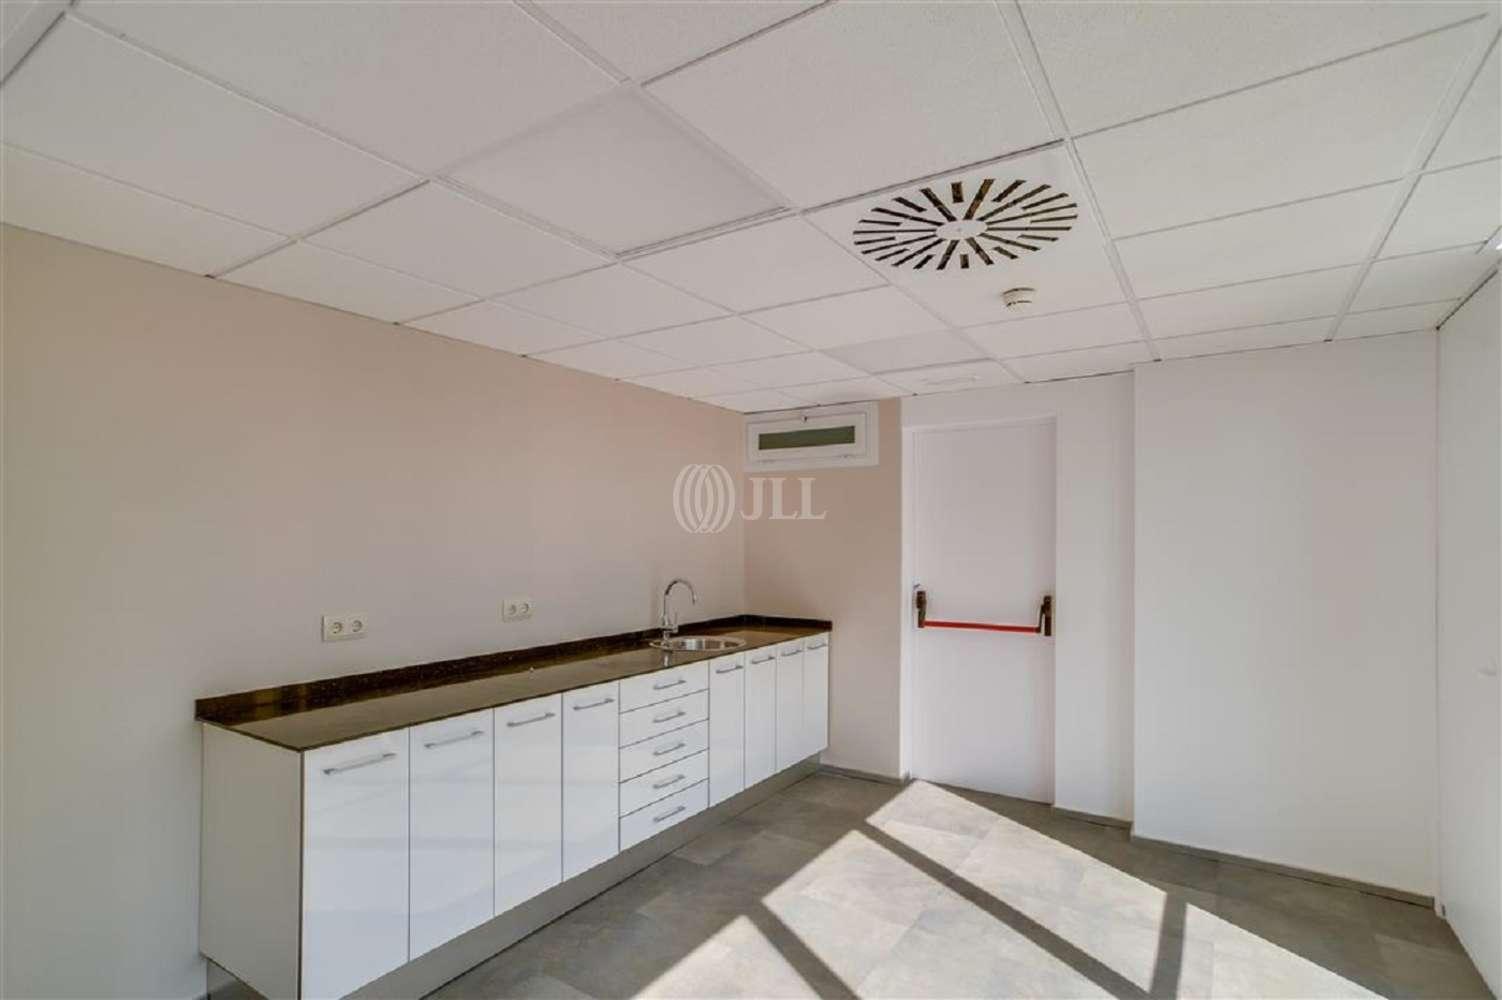 Oficina Sant just desvern, 08960 - DIAGONAL SANT JUST - Edificio A - 18596